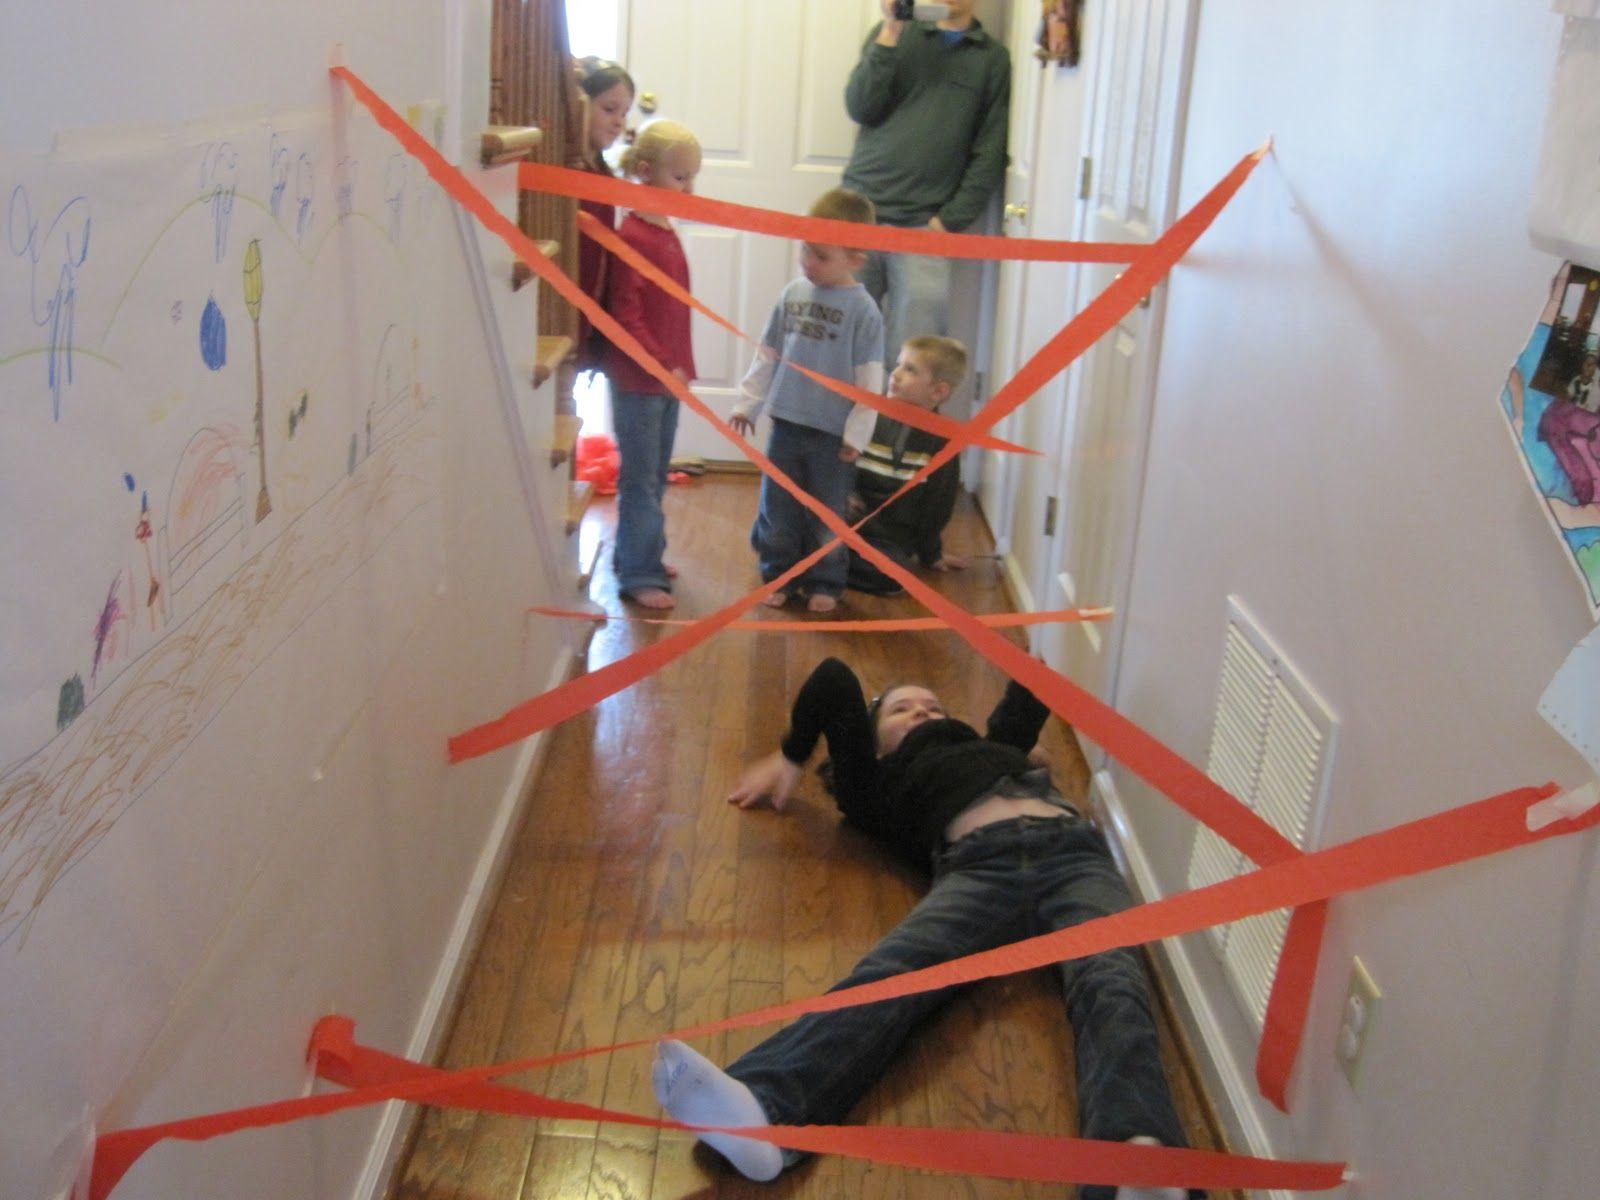 Masking tape + hallway = rainy day spy game. The boys will LOVE. Bring on the rain!